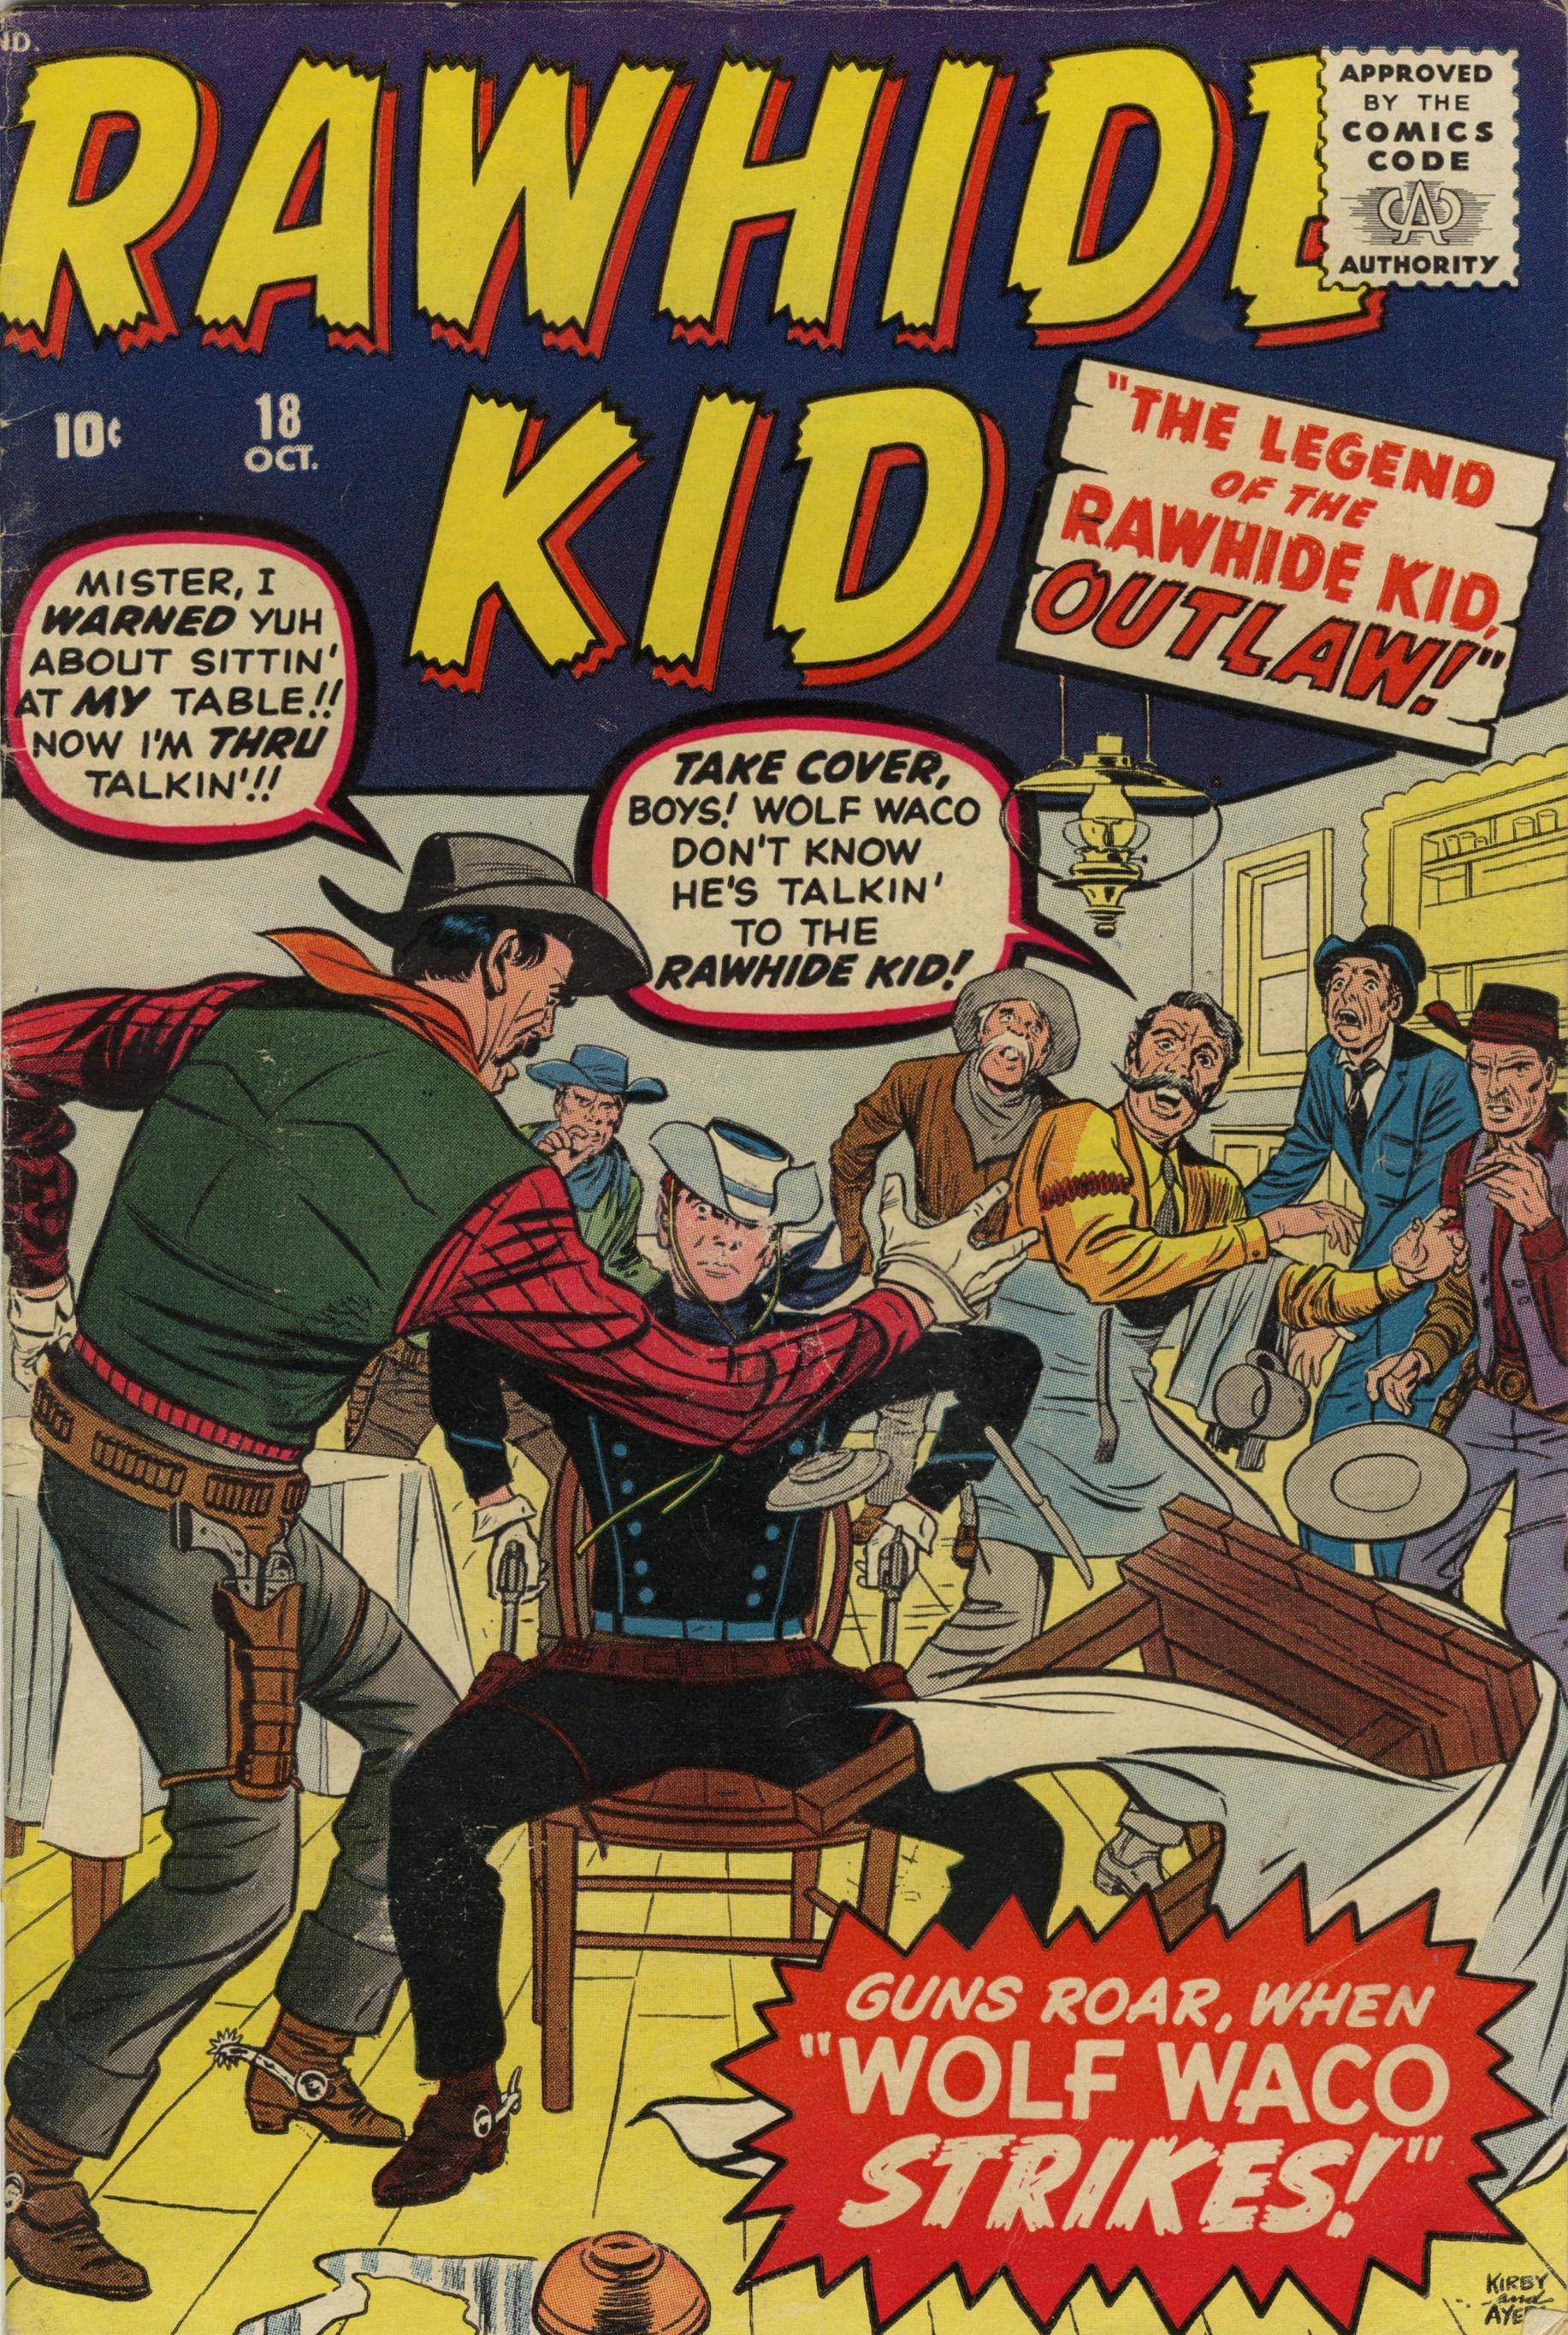 Rawhide Kid v1 018 1960 dell4c  Tomander